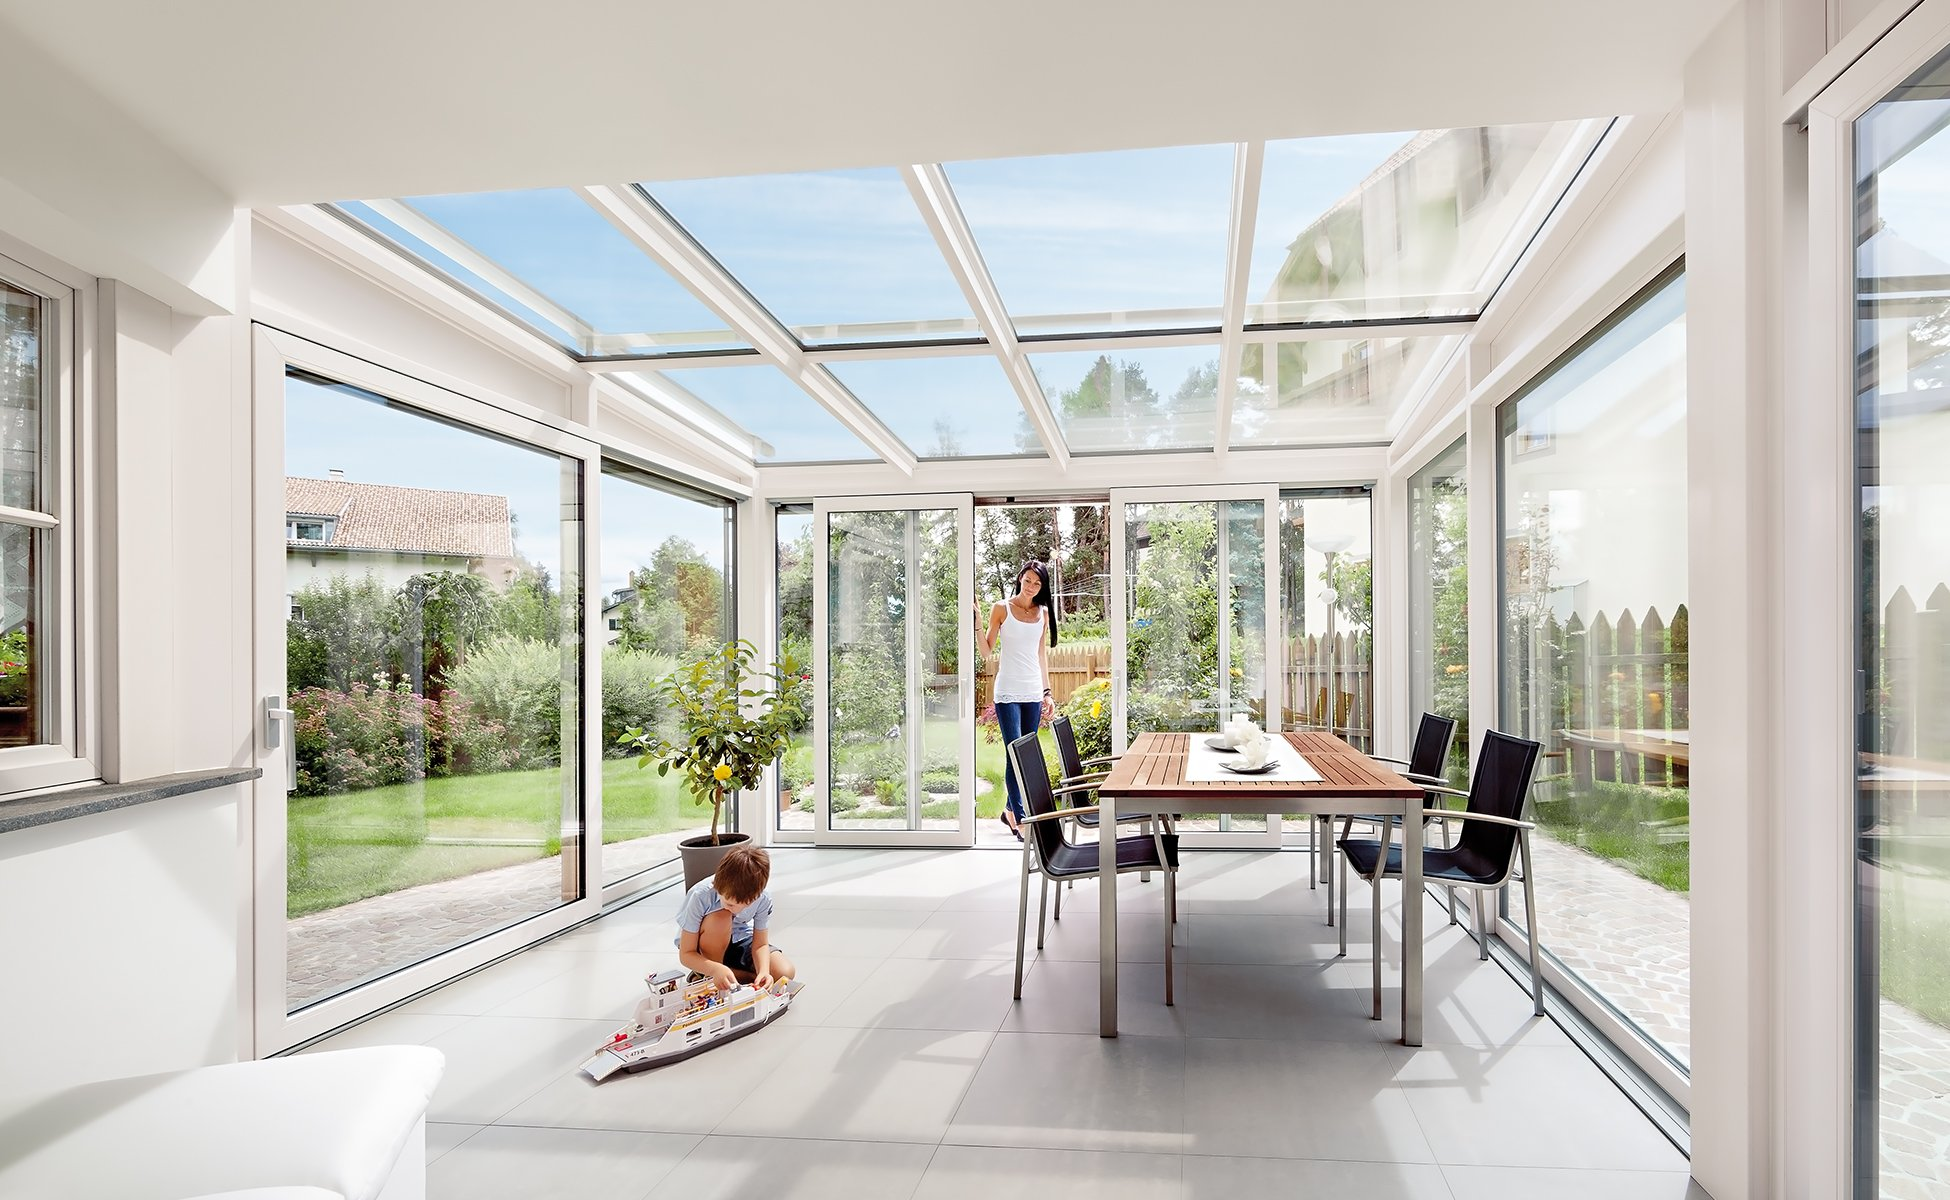 wintergarten tischlerei harald pucher. Black Bedroom Furniture Sets. Home Design Ideas